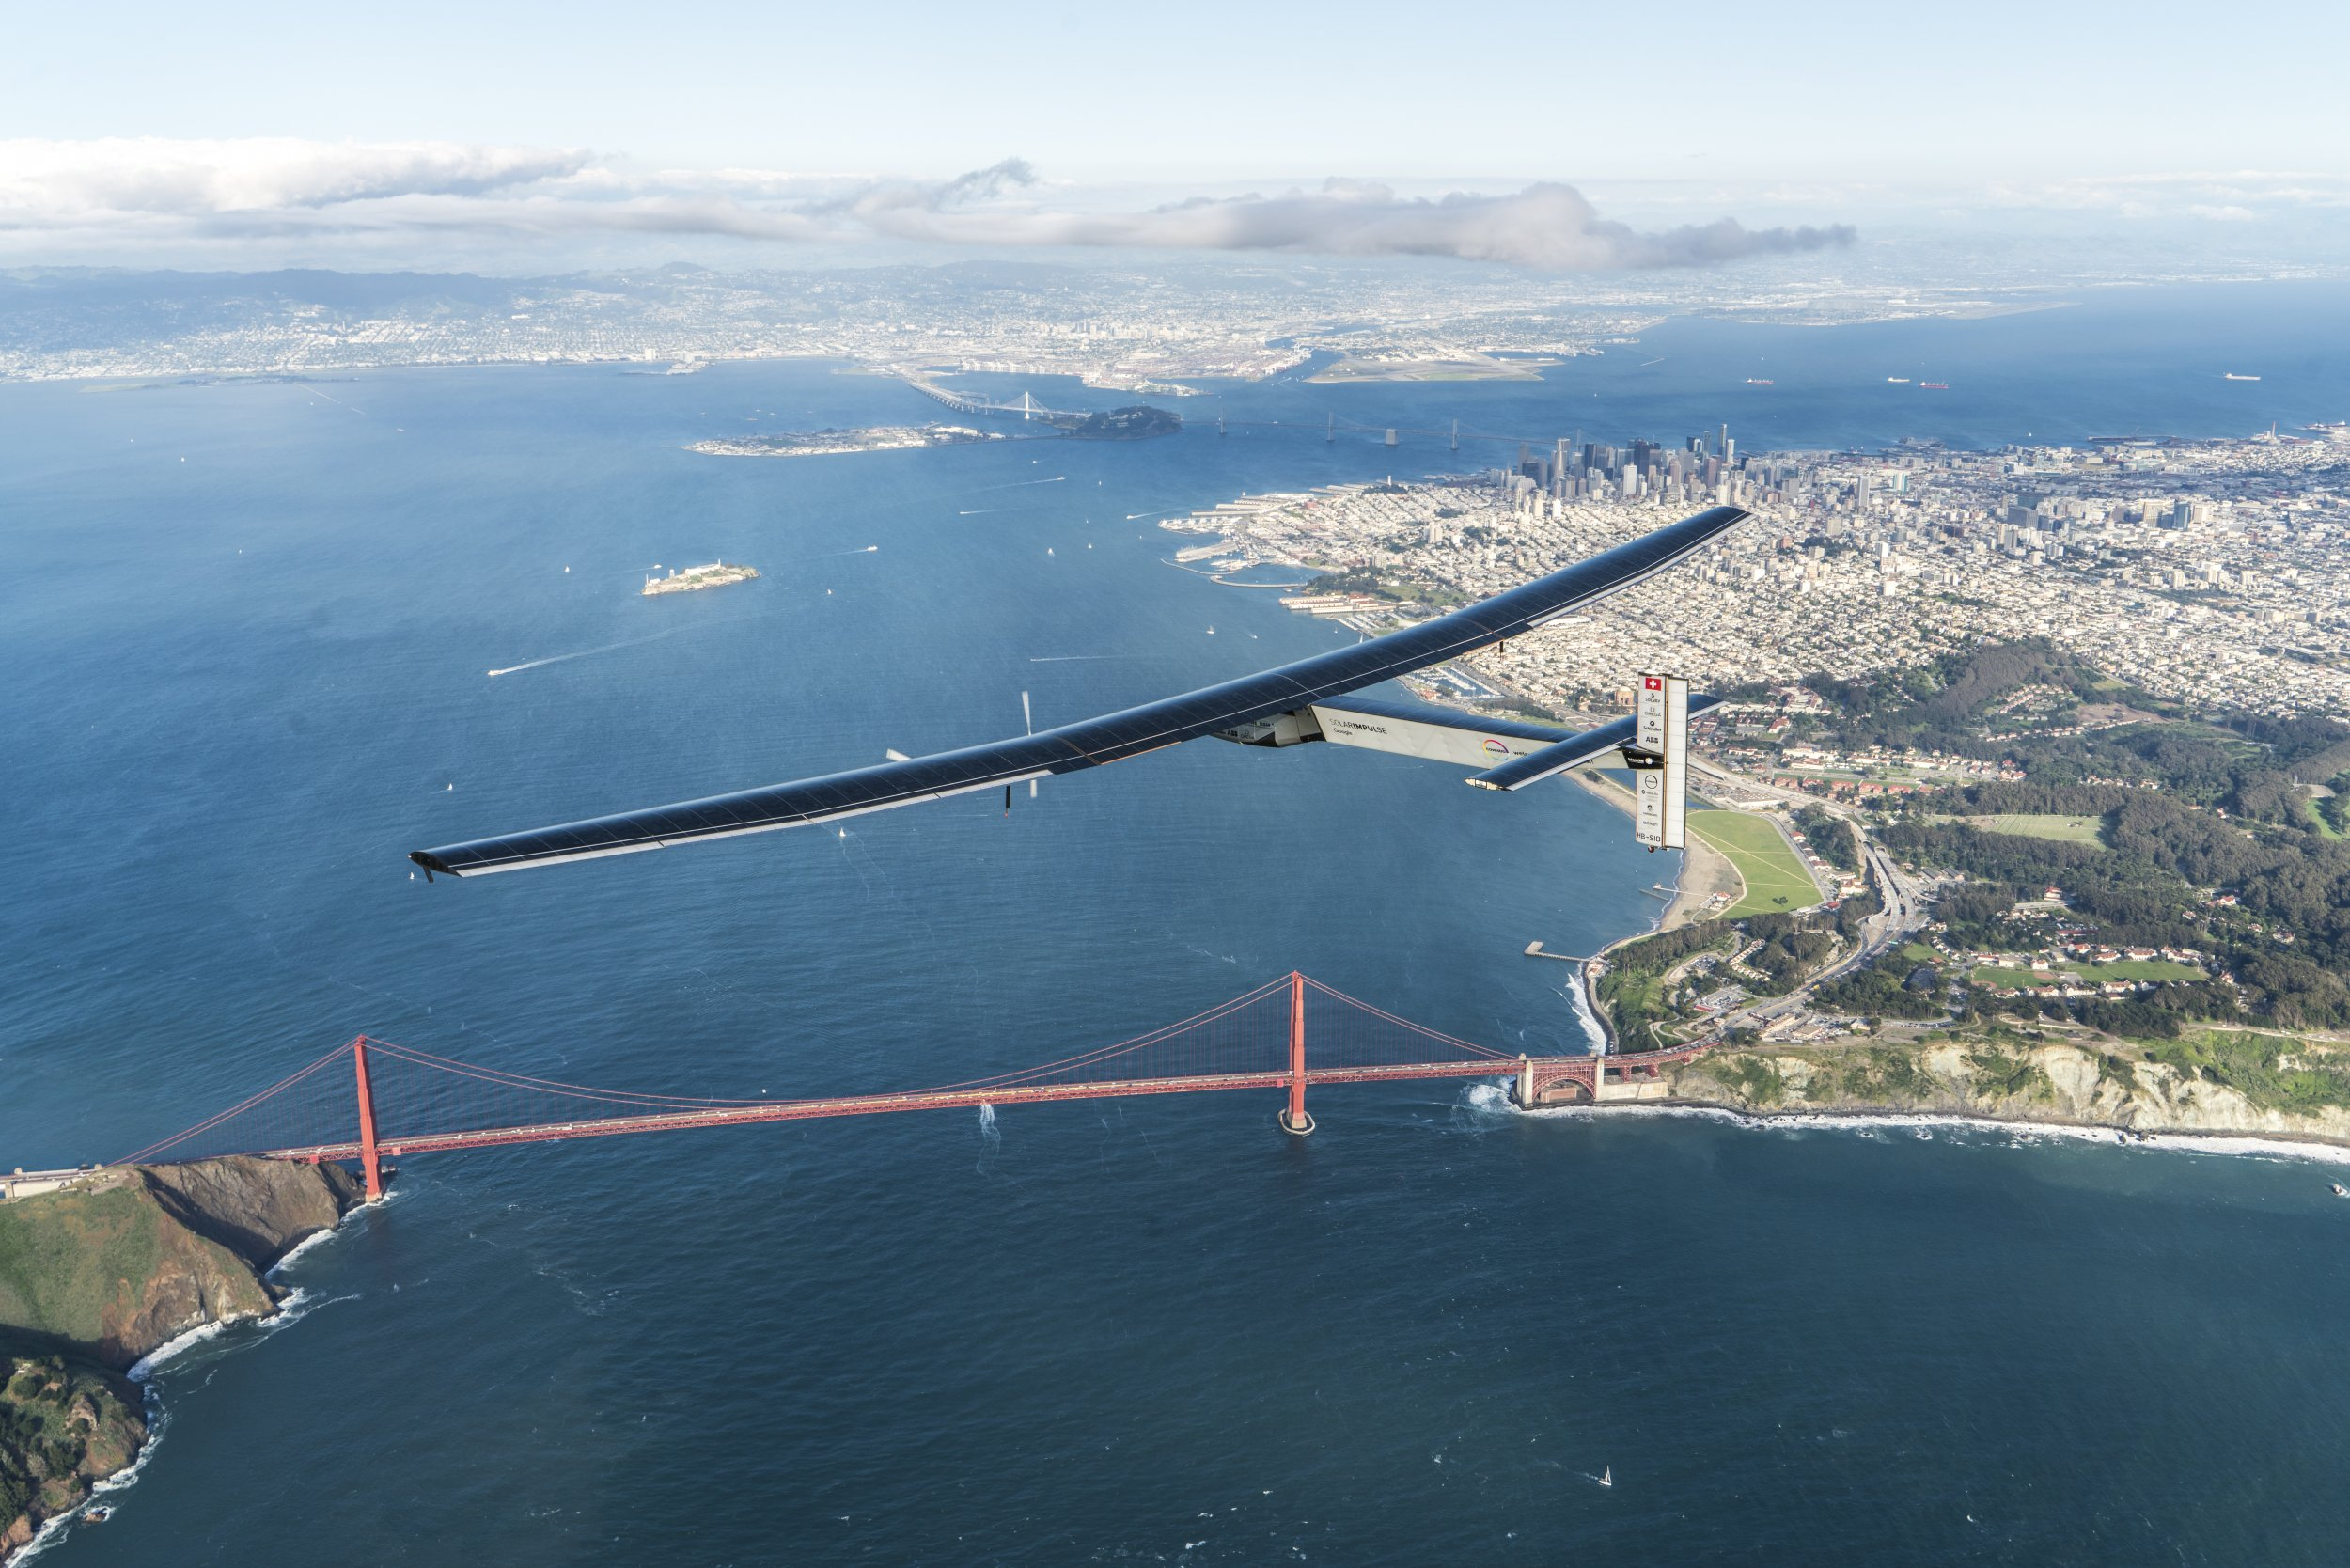 4-25-16 Solar Impulse